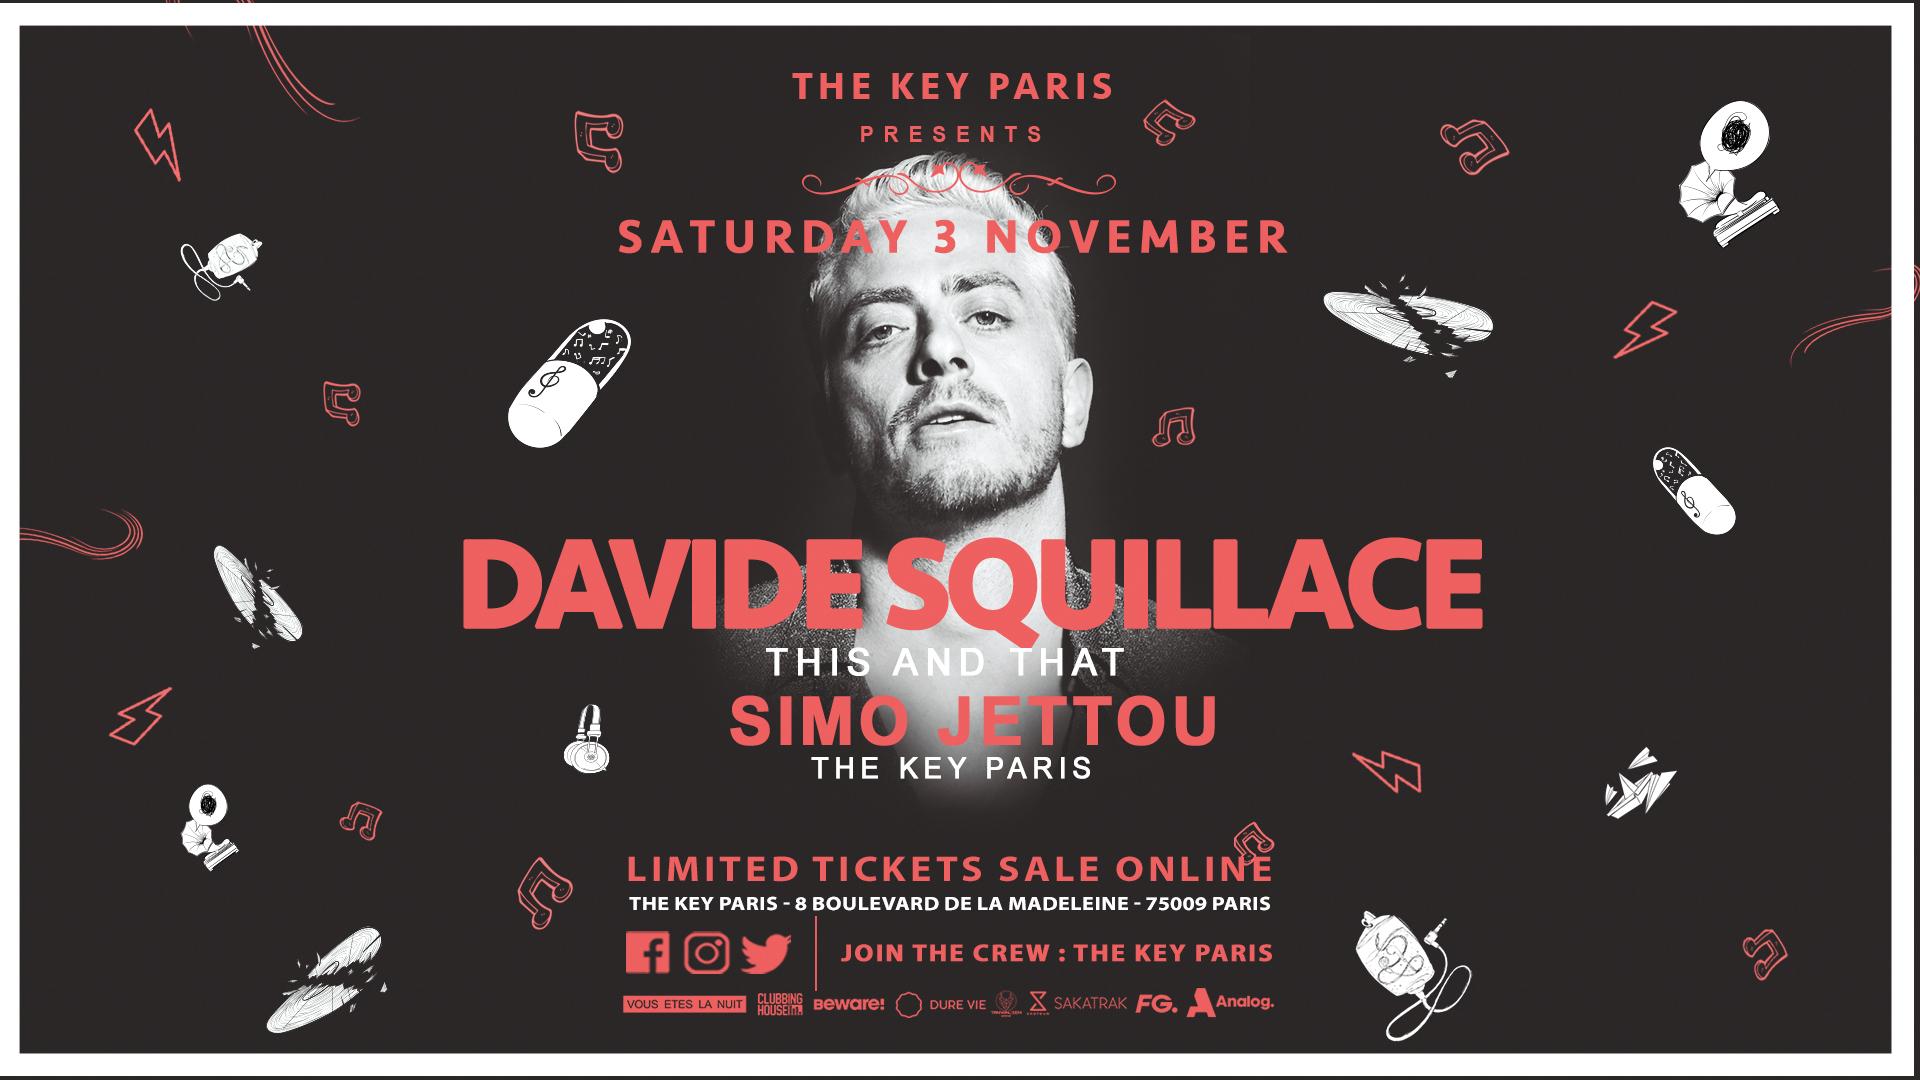 The Key Paris presents : David Squillace